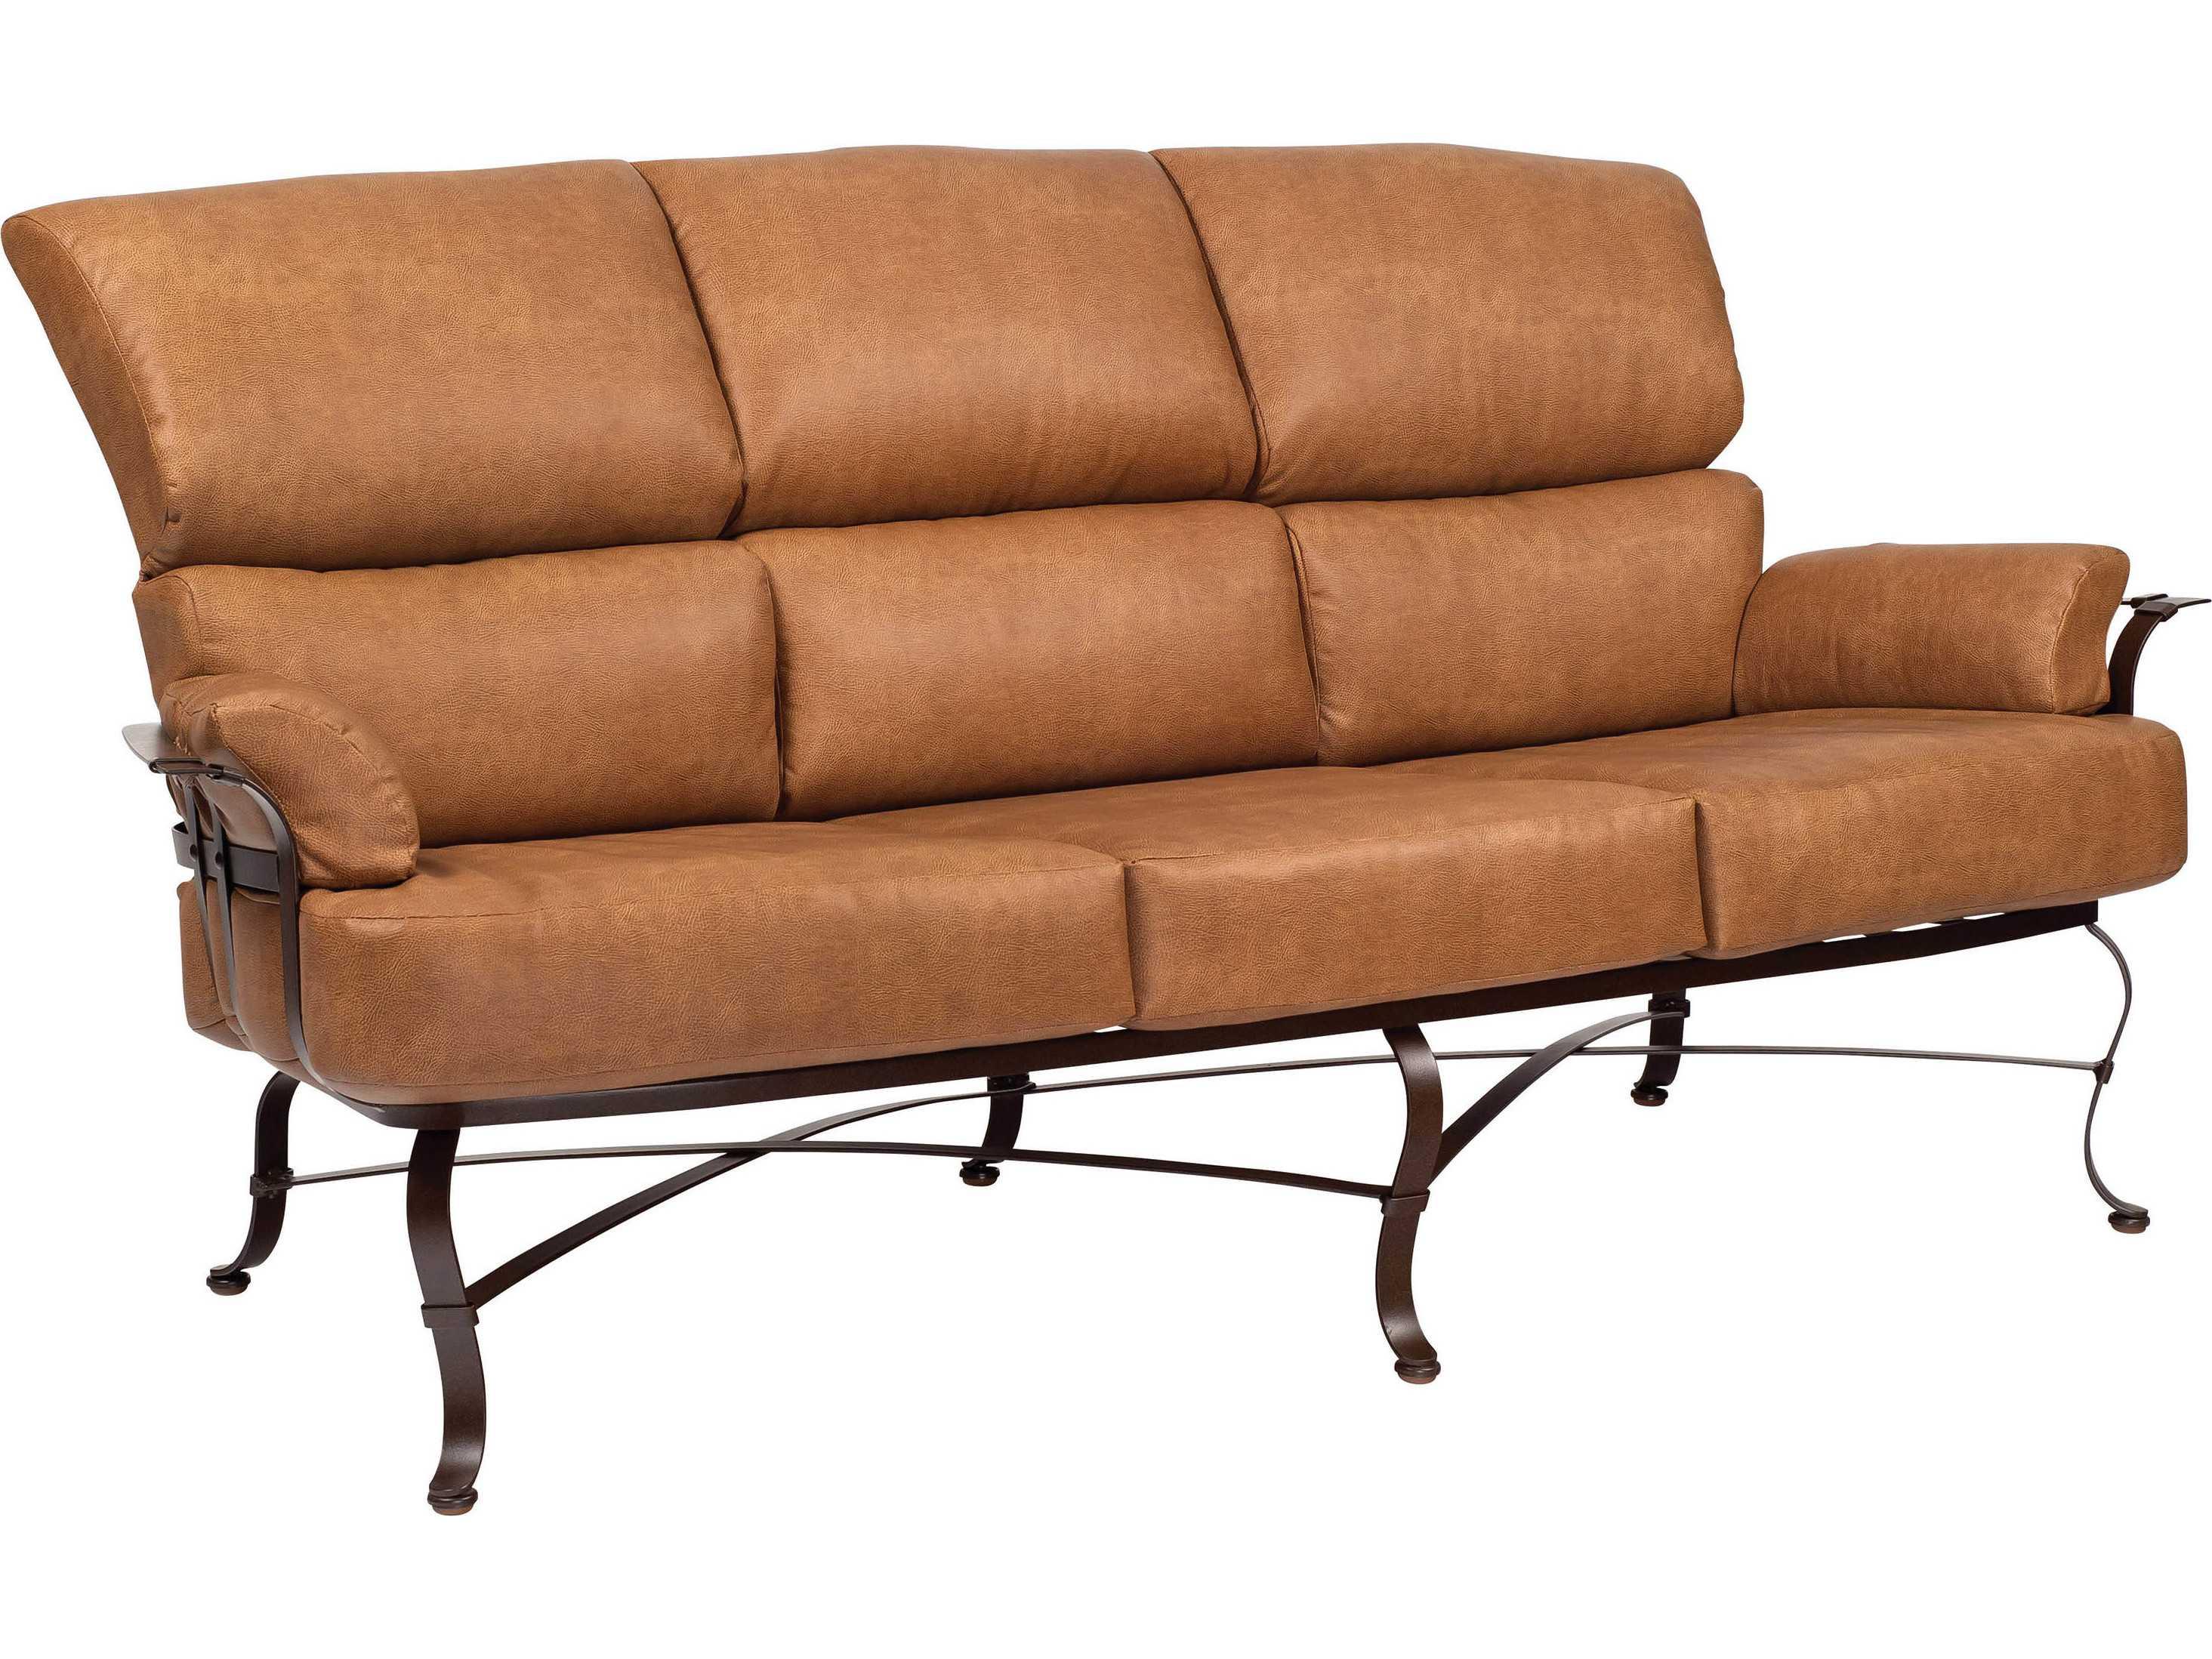 Woodard Atlas Wrought Iron Sofa 2l0020